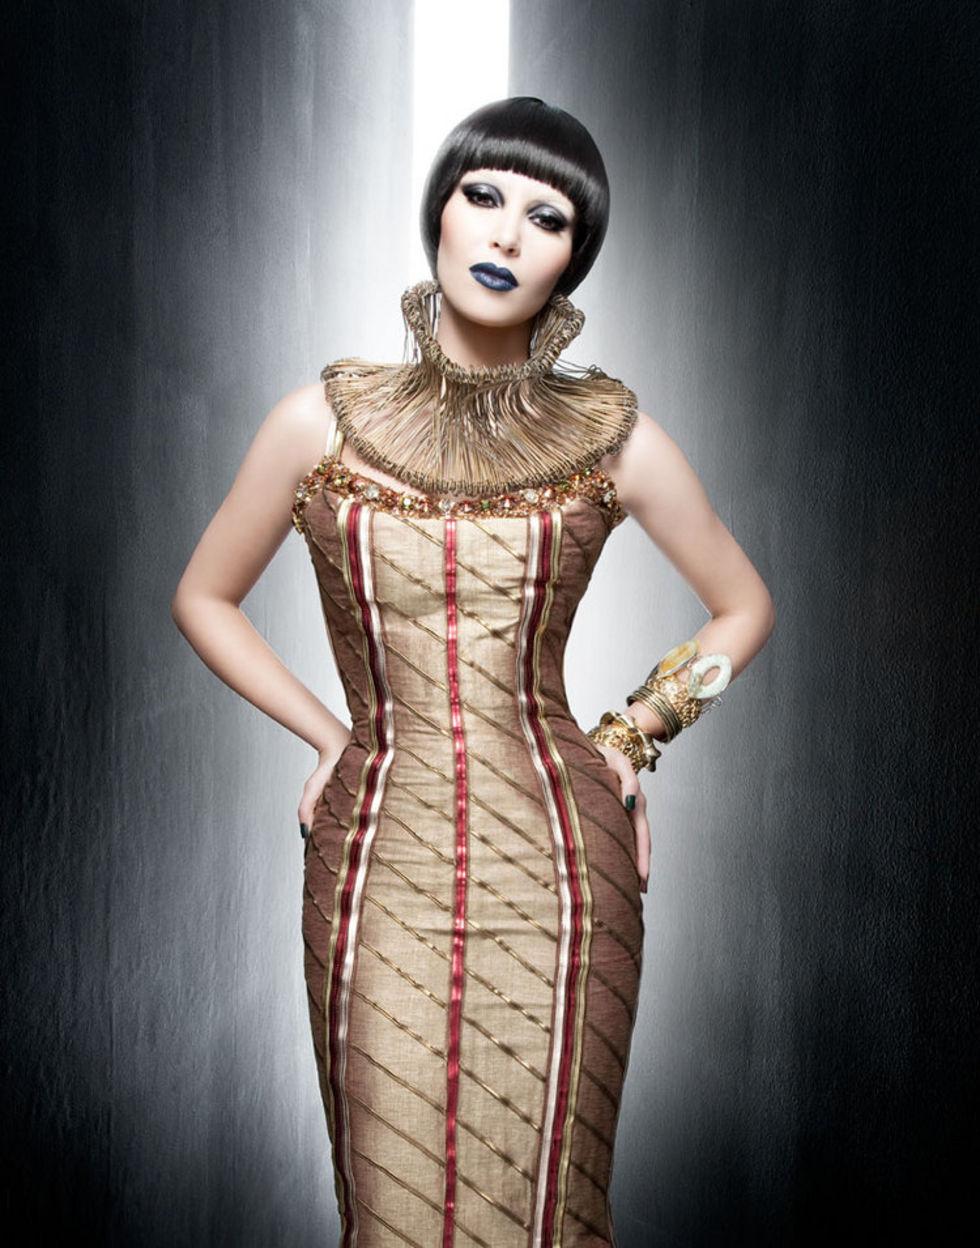 kim-kardashian-yrb-magazine-september-2009-01